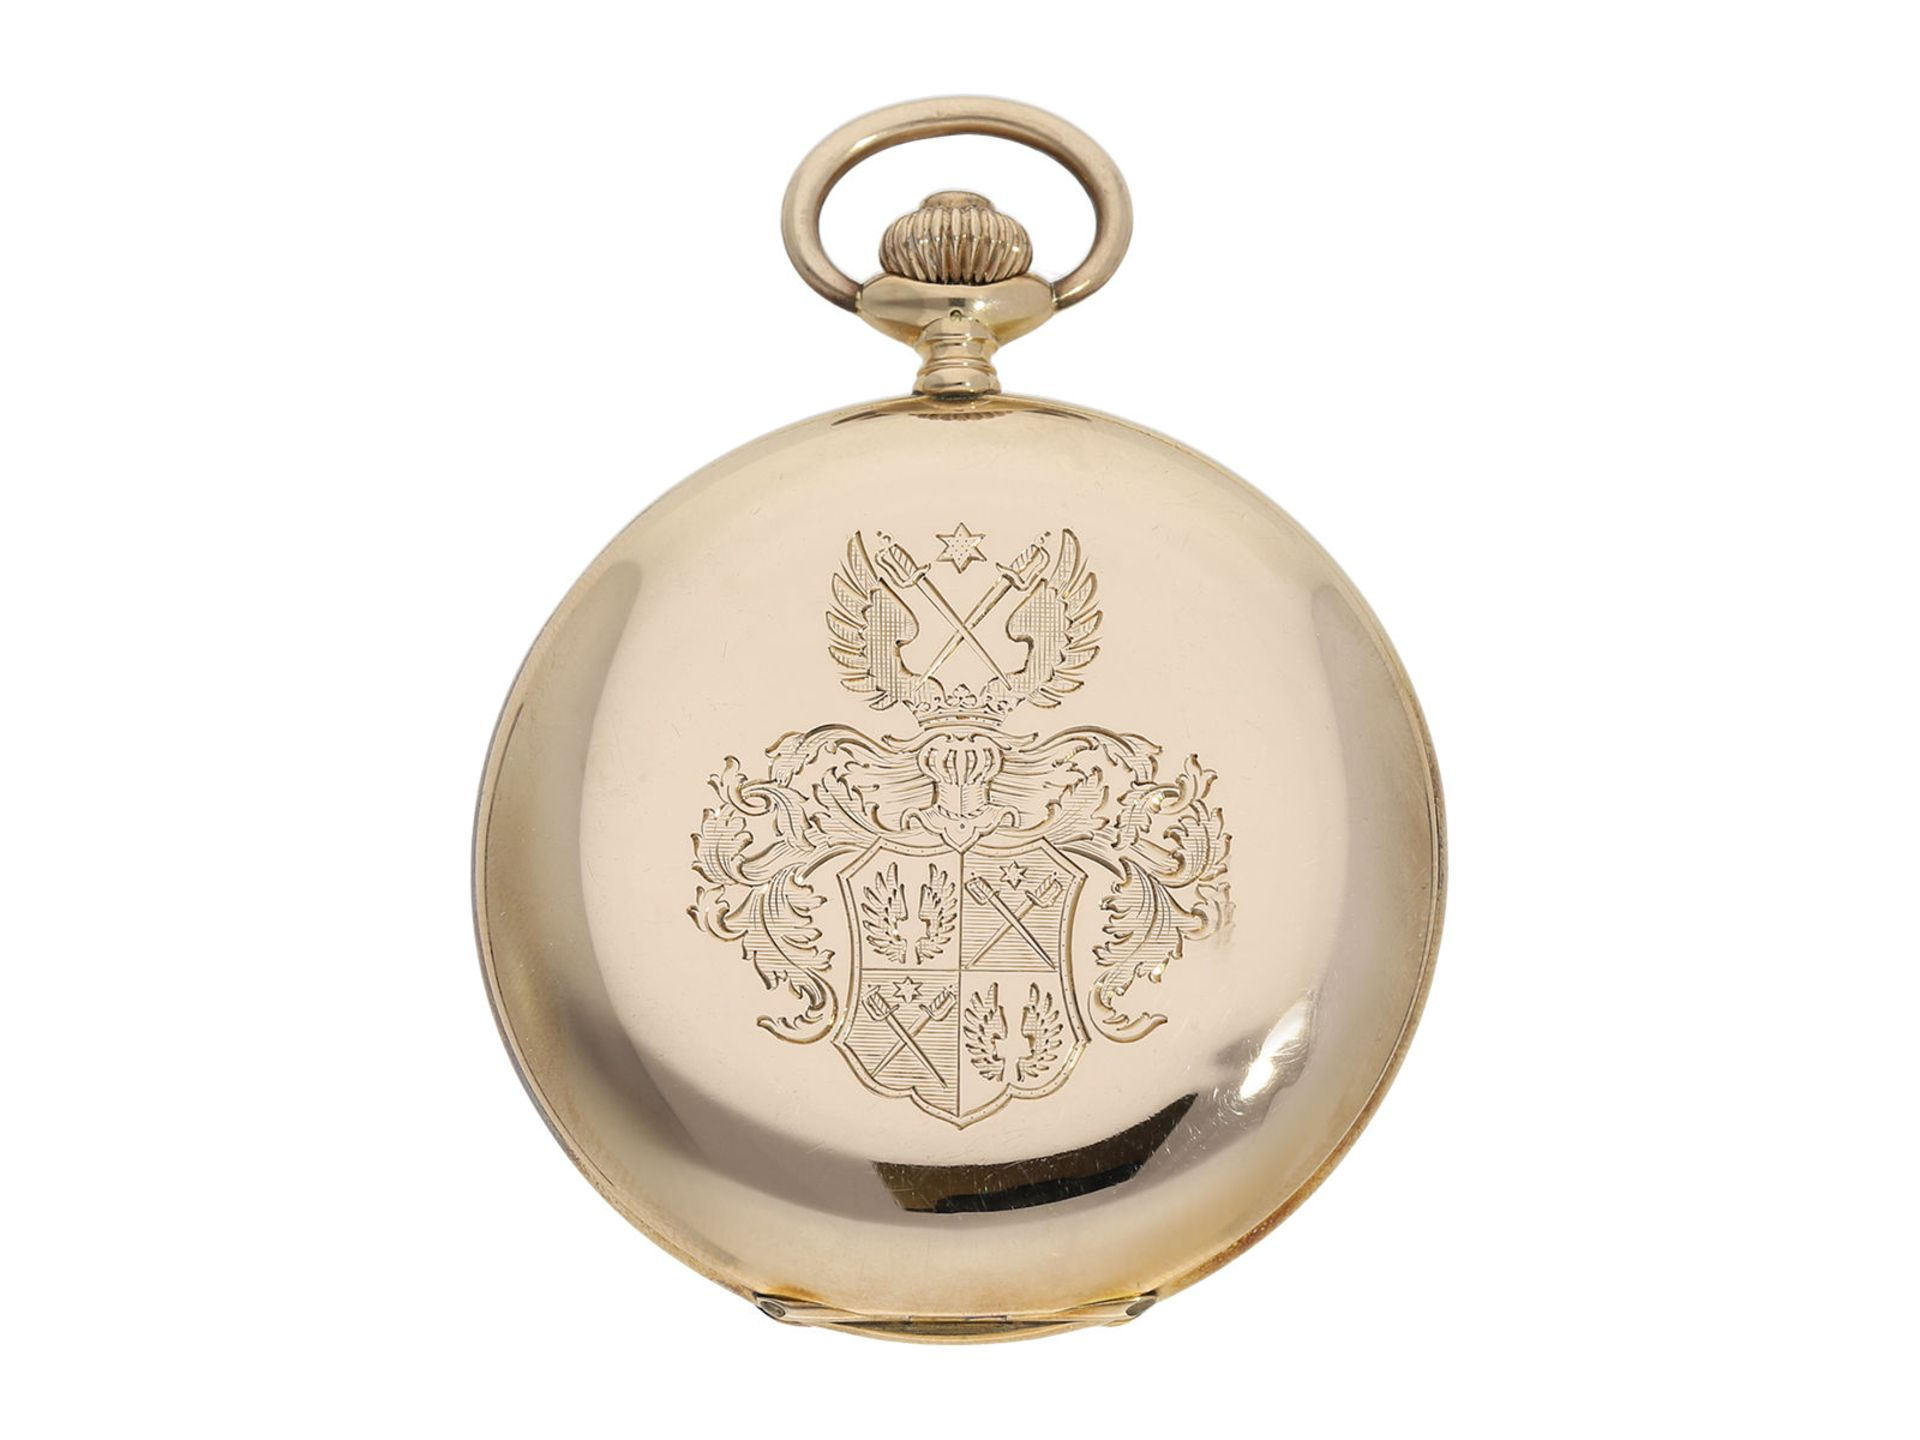 Pocket watch: historically interesting gold hunting case watch from the property of Kurt von - Bild 7 aus 7